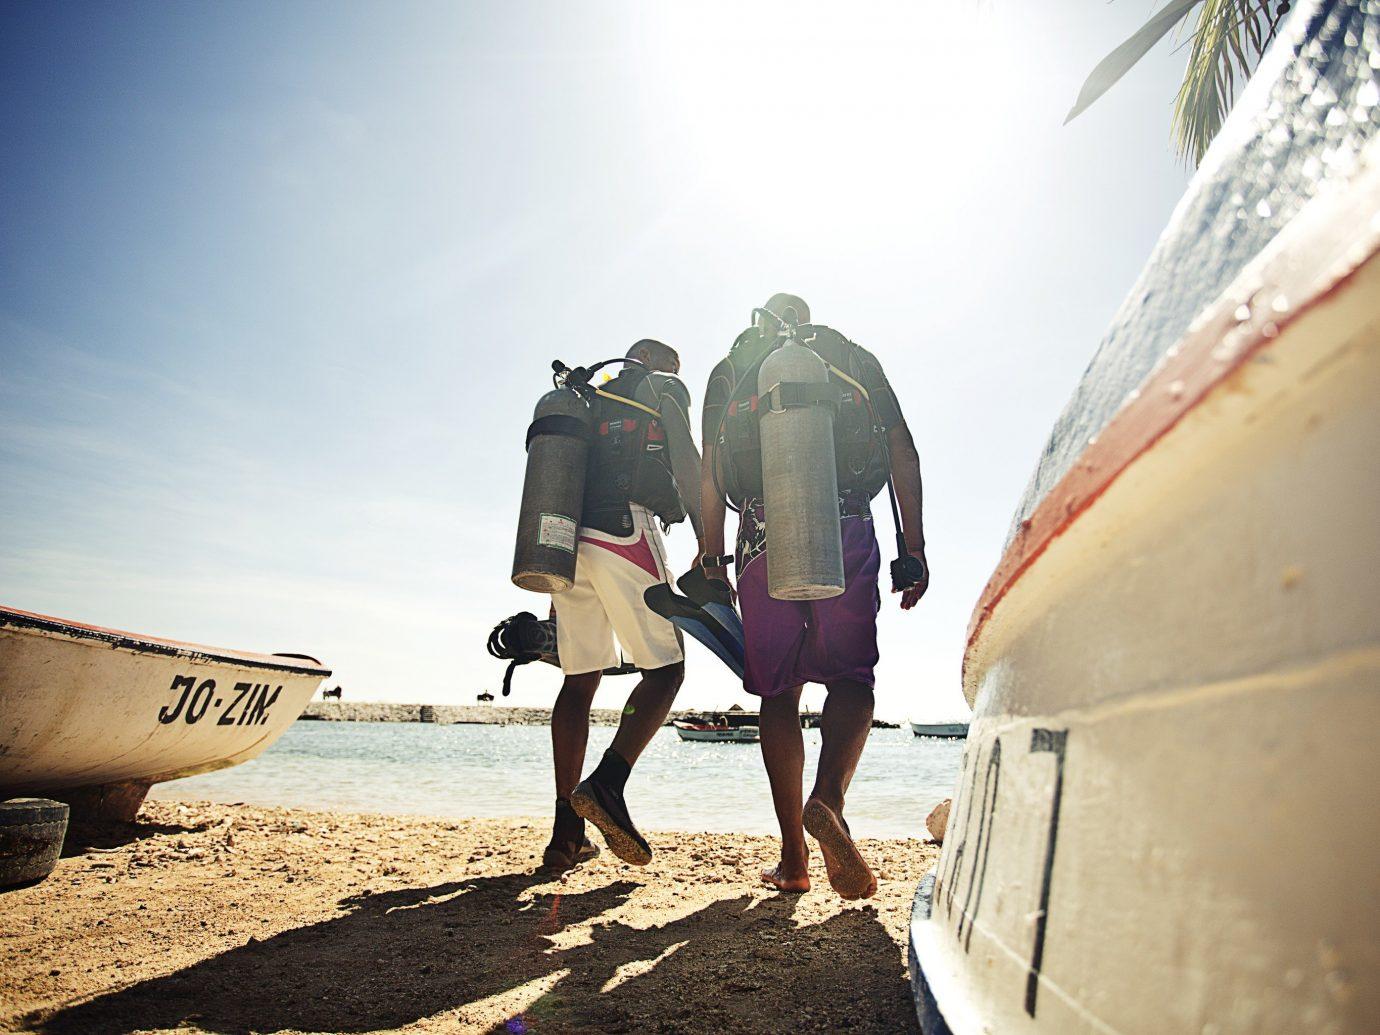 Beaches caribbean outdoor sky surfing Beach vacation fun sunlight sand tourism girl recreation travel water